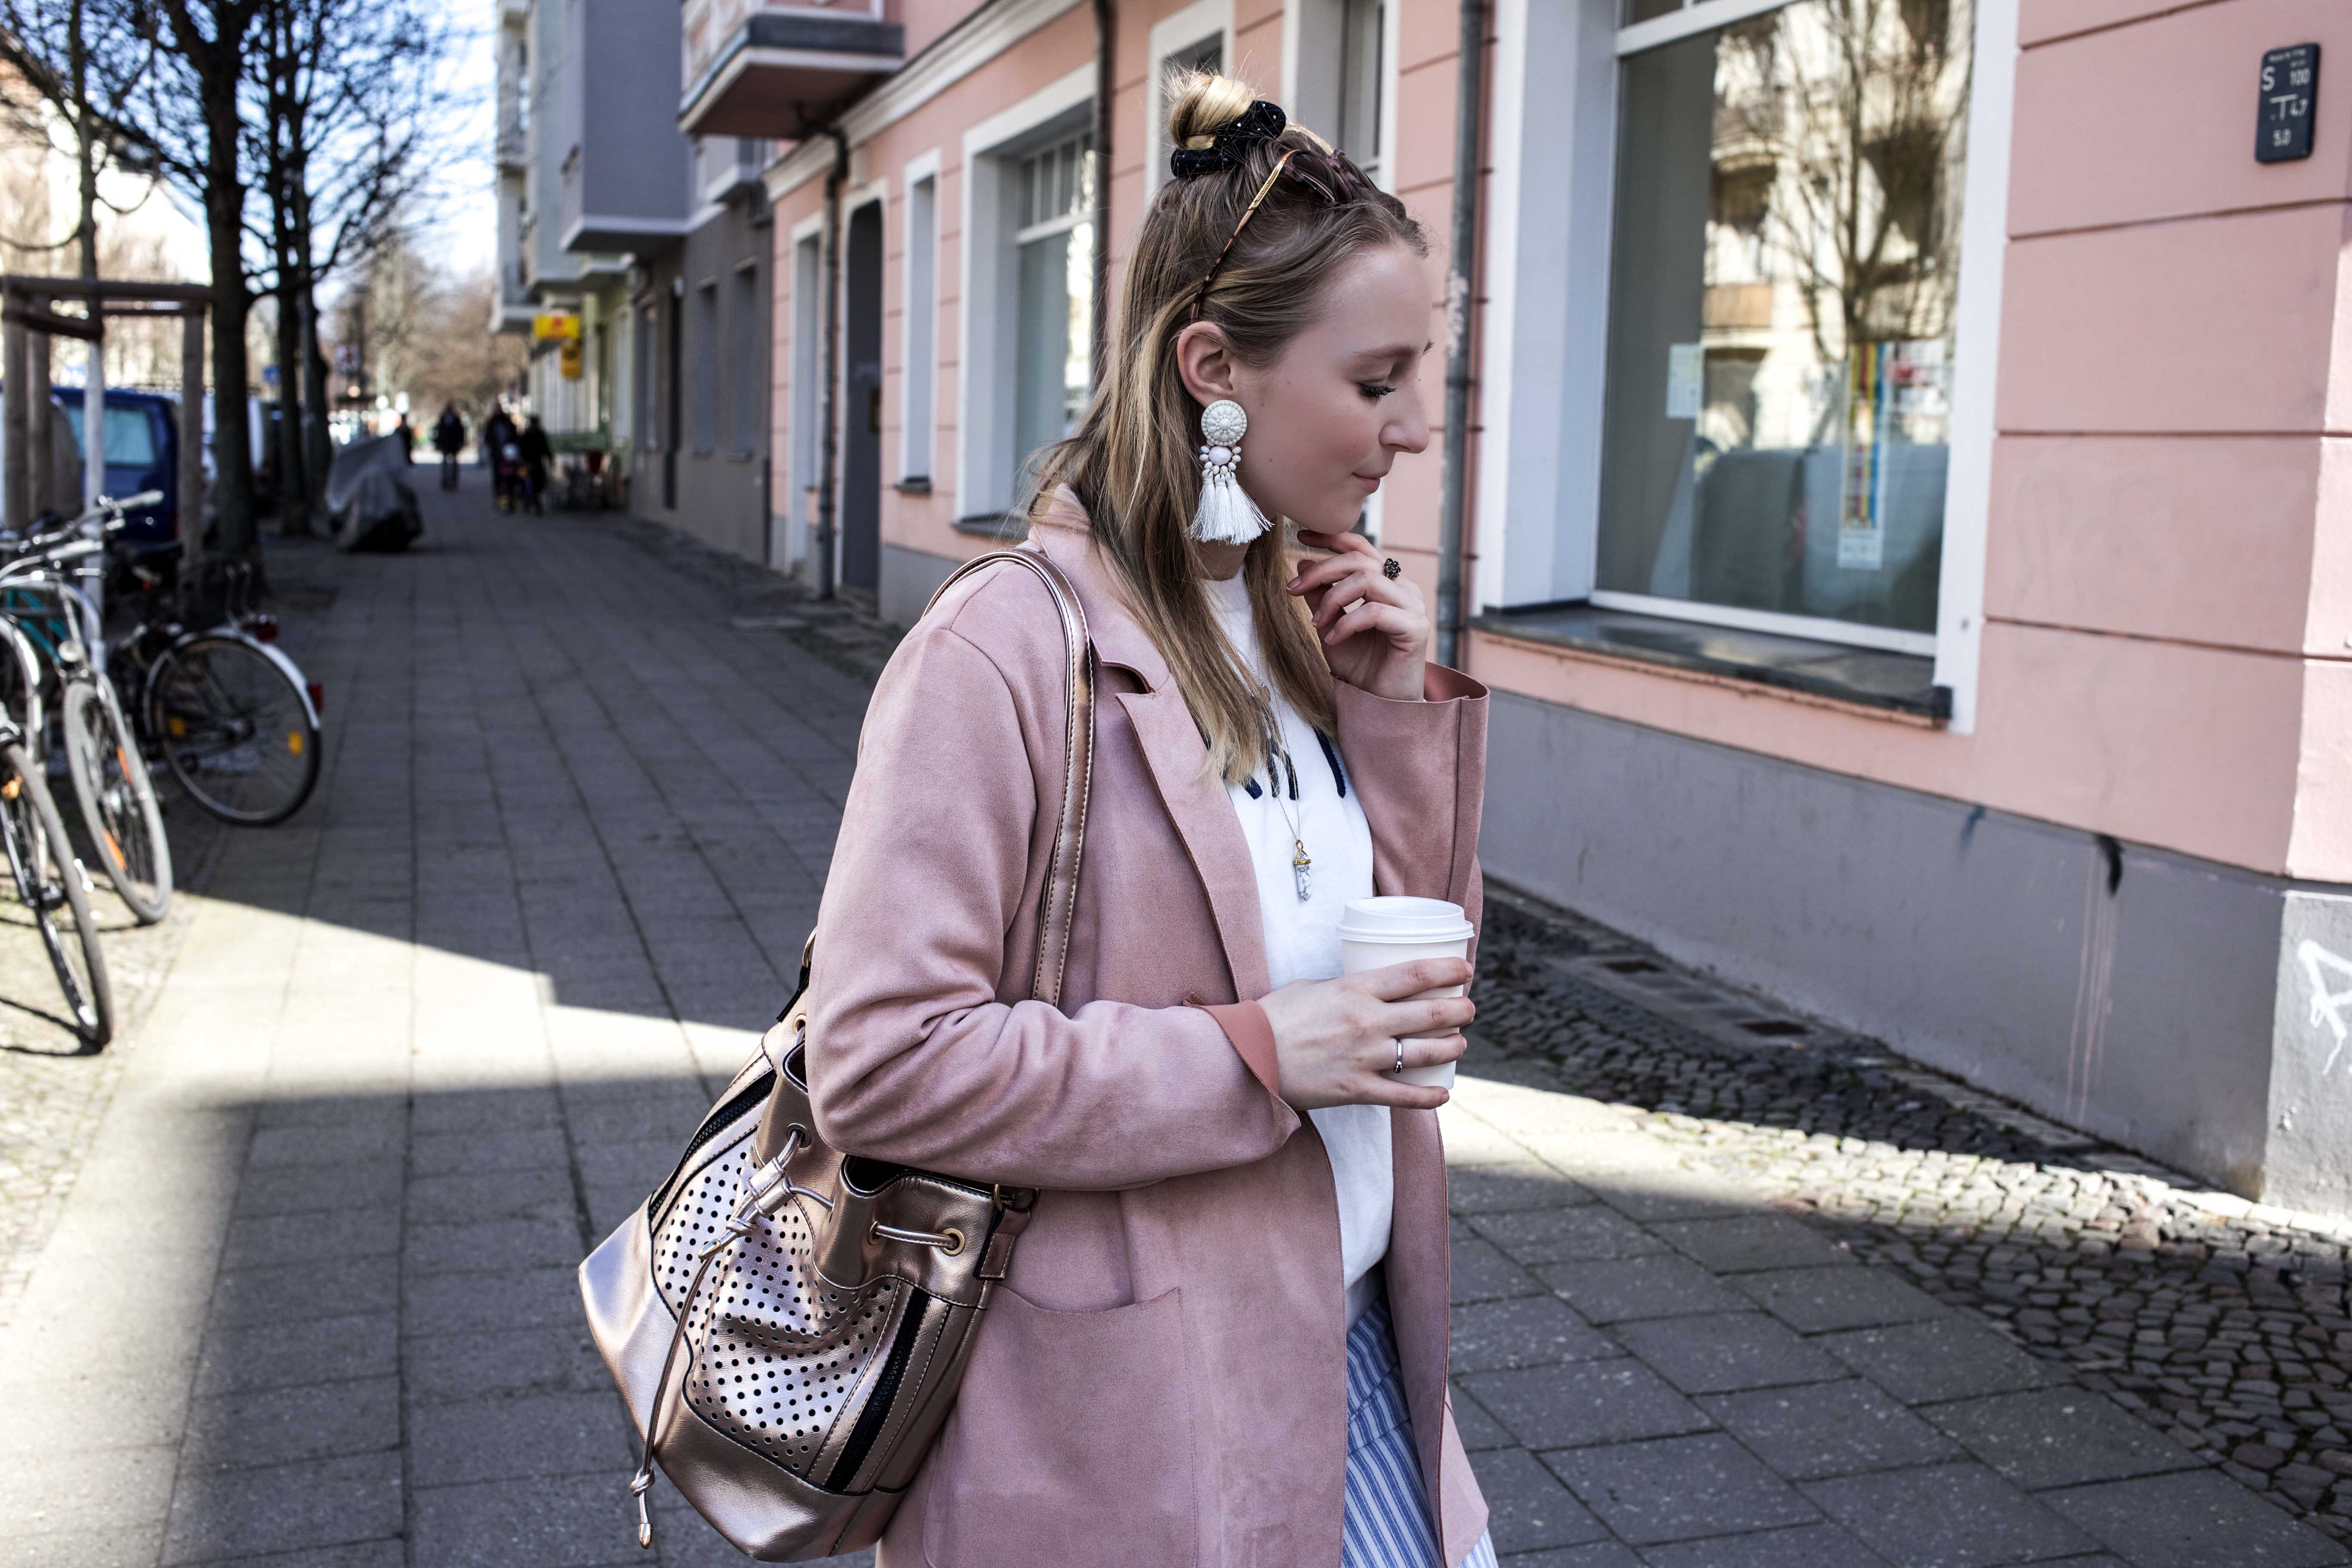 spring-look-frühlingsoutfit-rosegold-rosa-gestreifte-jeans-prenzlauer-berg_5200